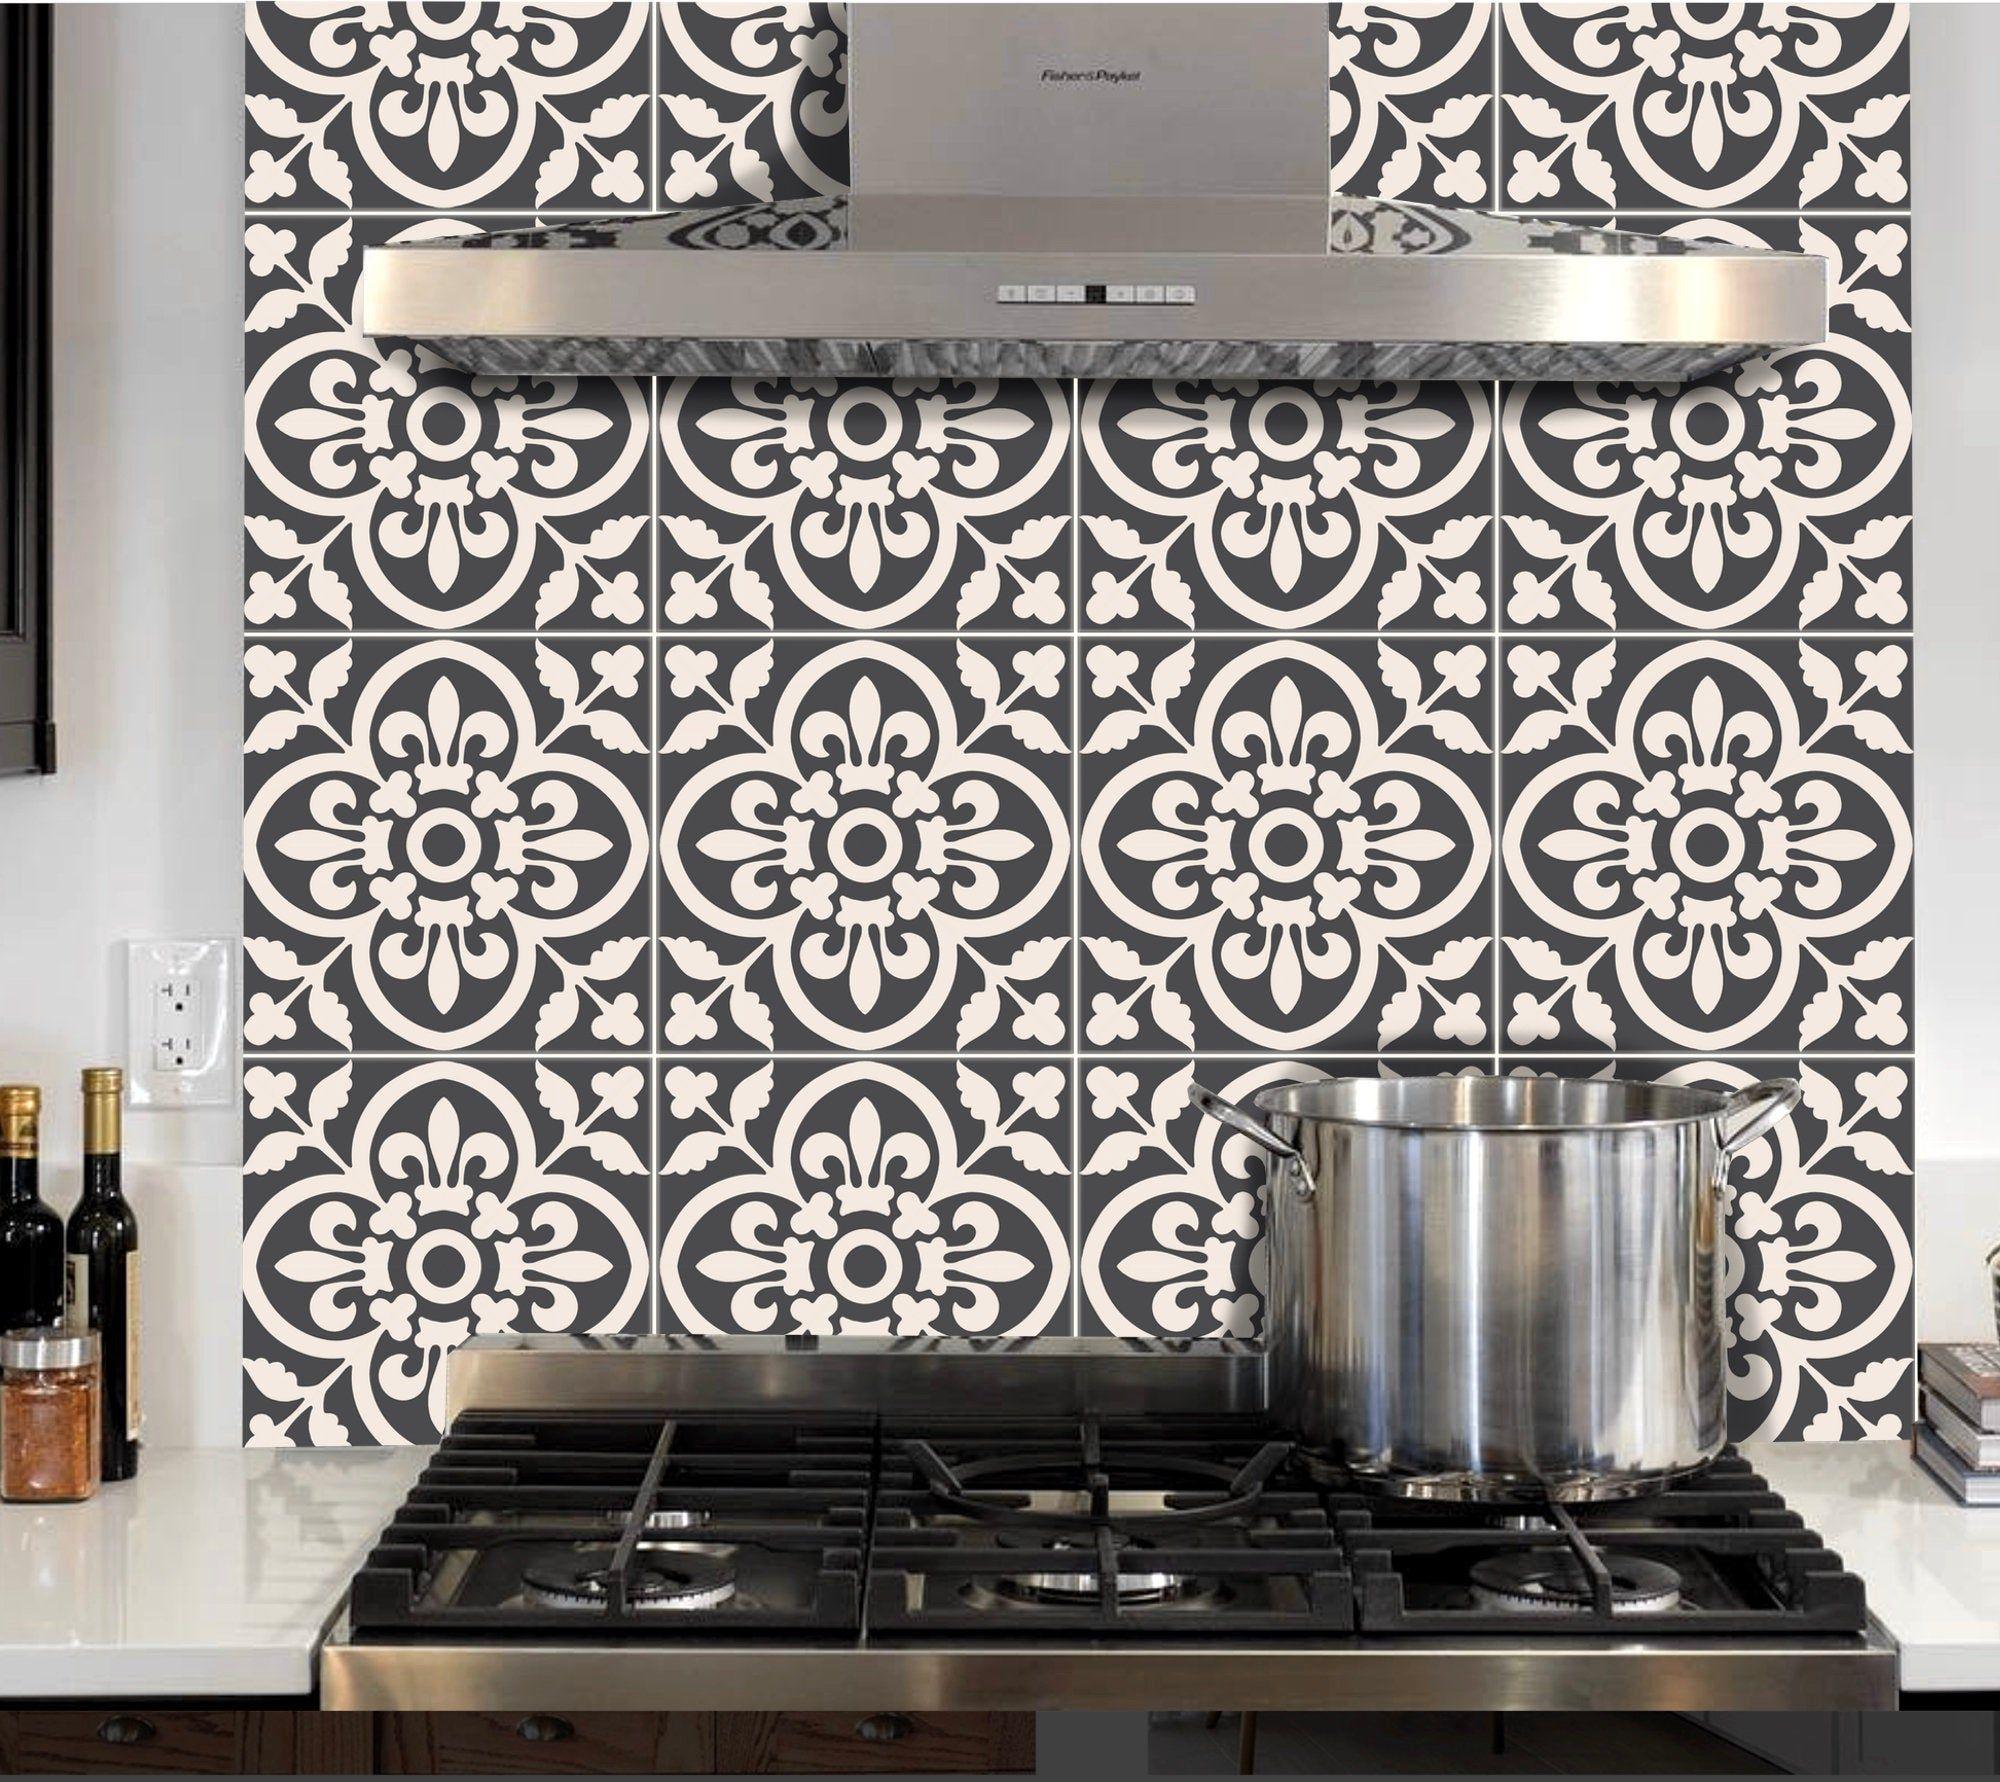 Tile Sticker Kitchen Bath Floor Wall Waterproof Removable Peel N Stick A67 Tile Stickers Kitchen Wall Waterproofing Kitchen And Bath